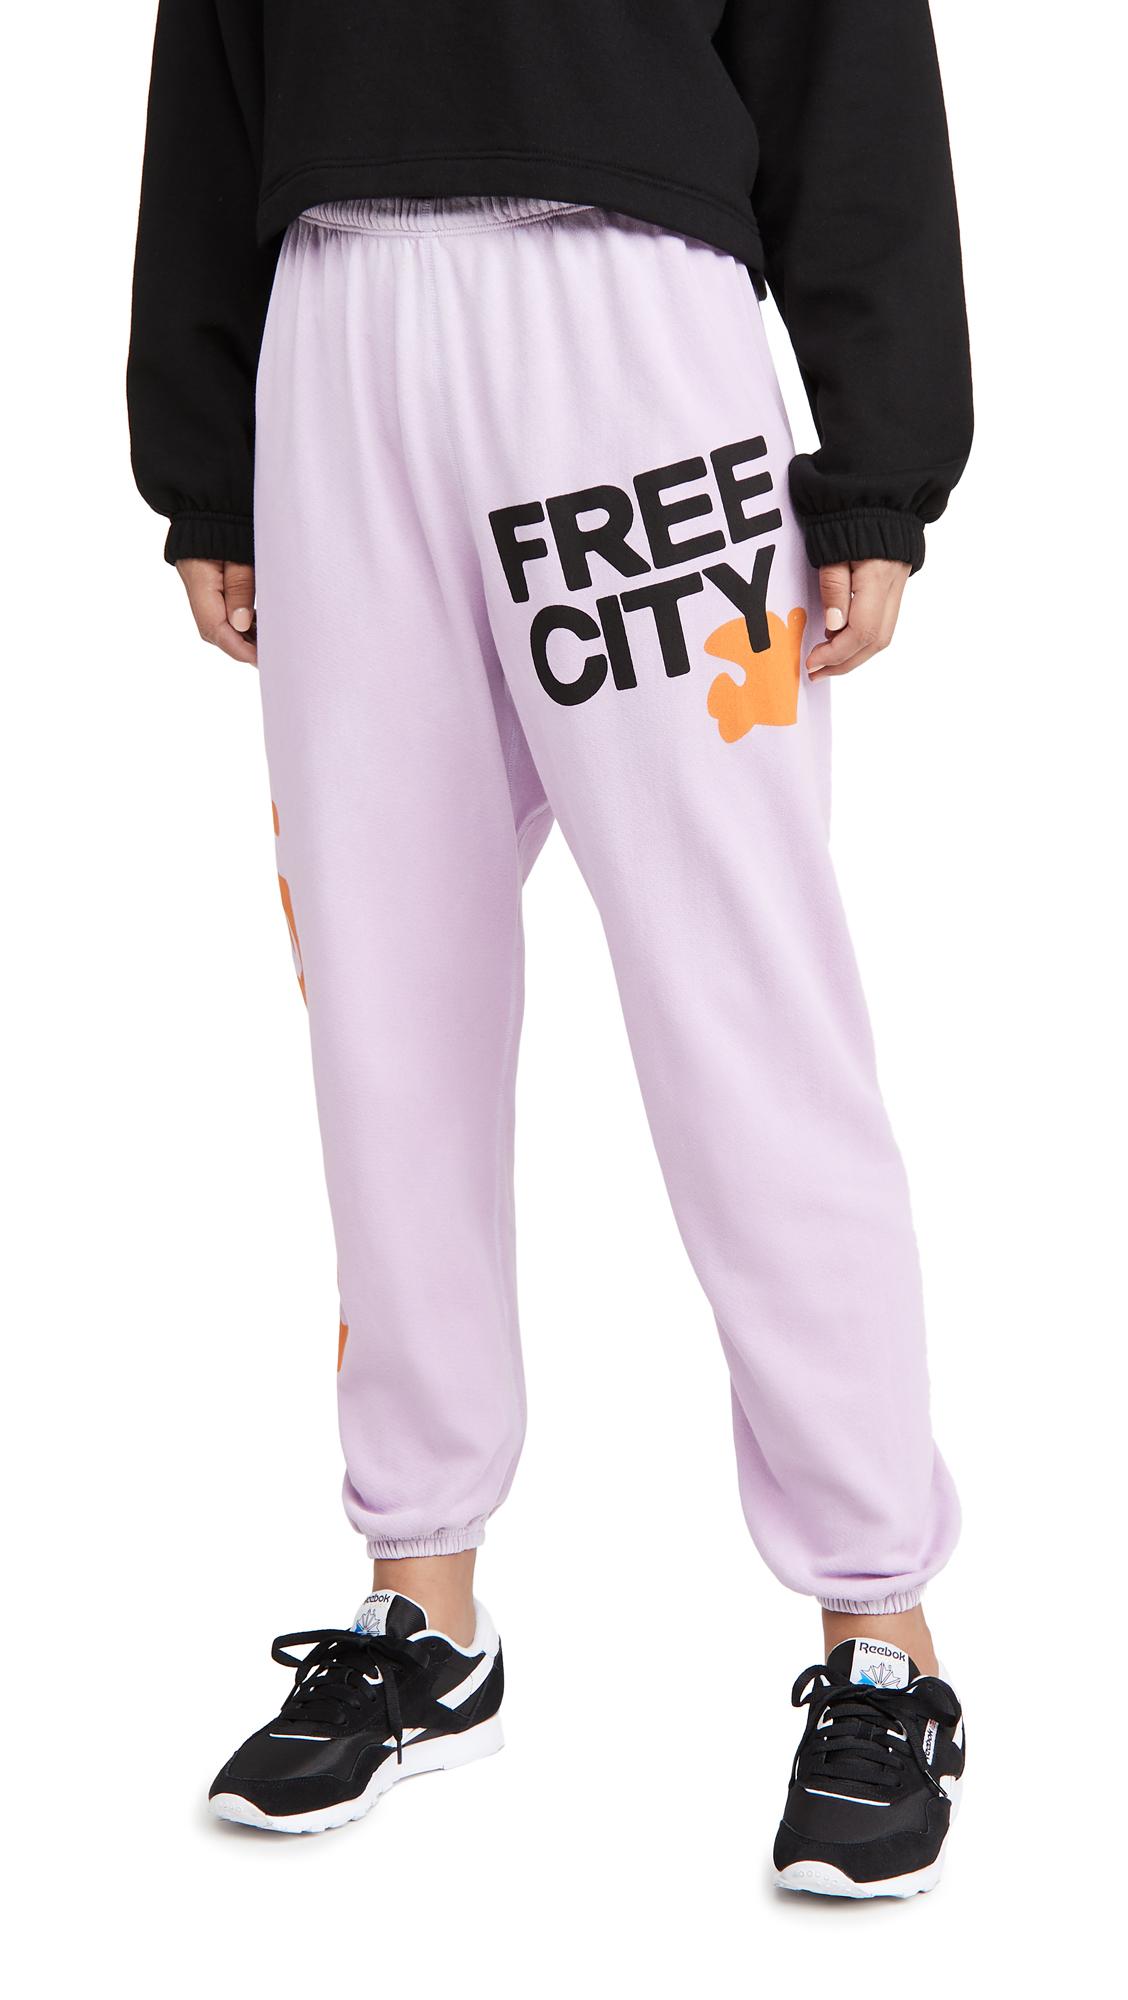 FREECITY Lets Go Freecity Sweatpants